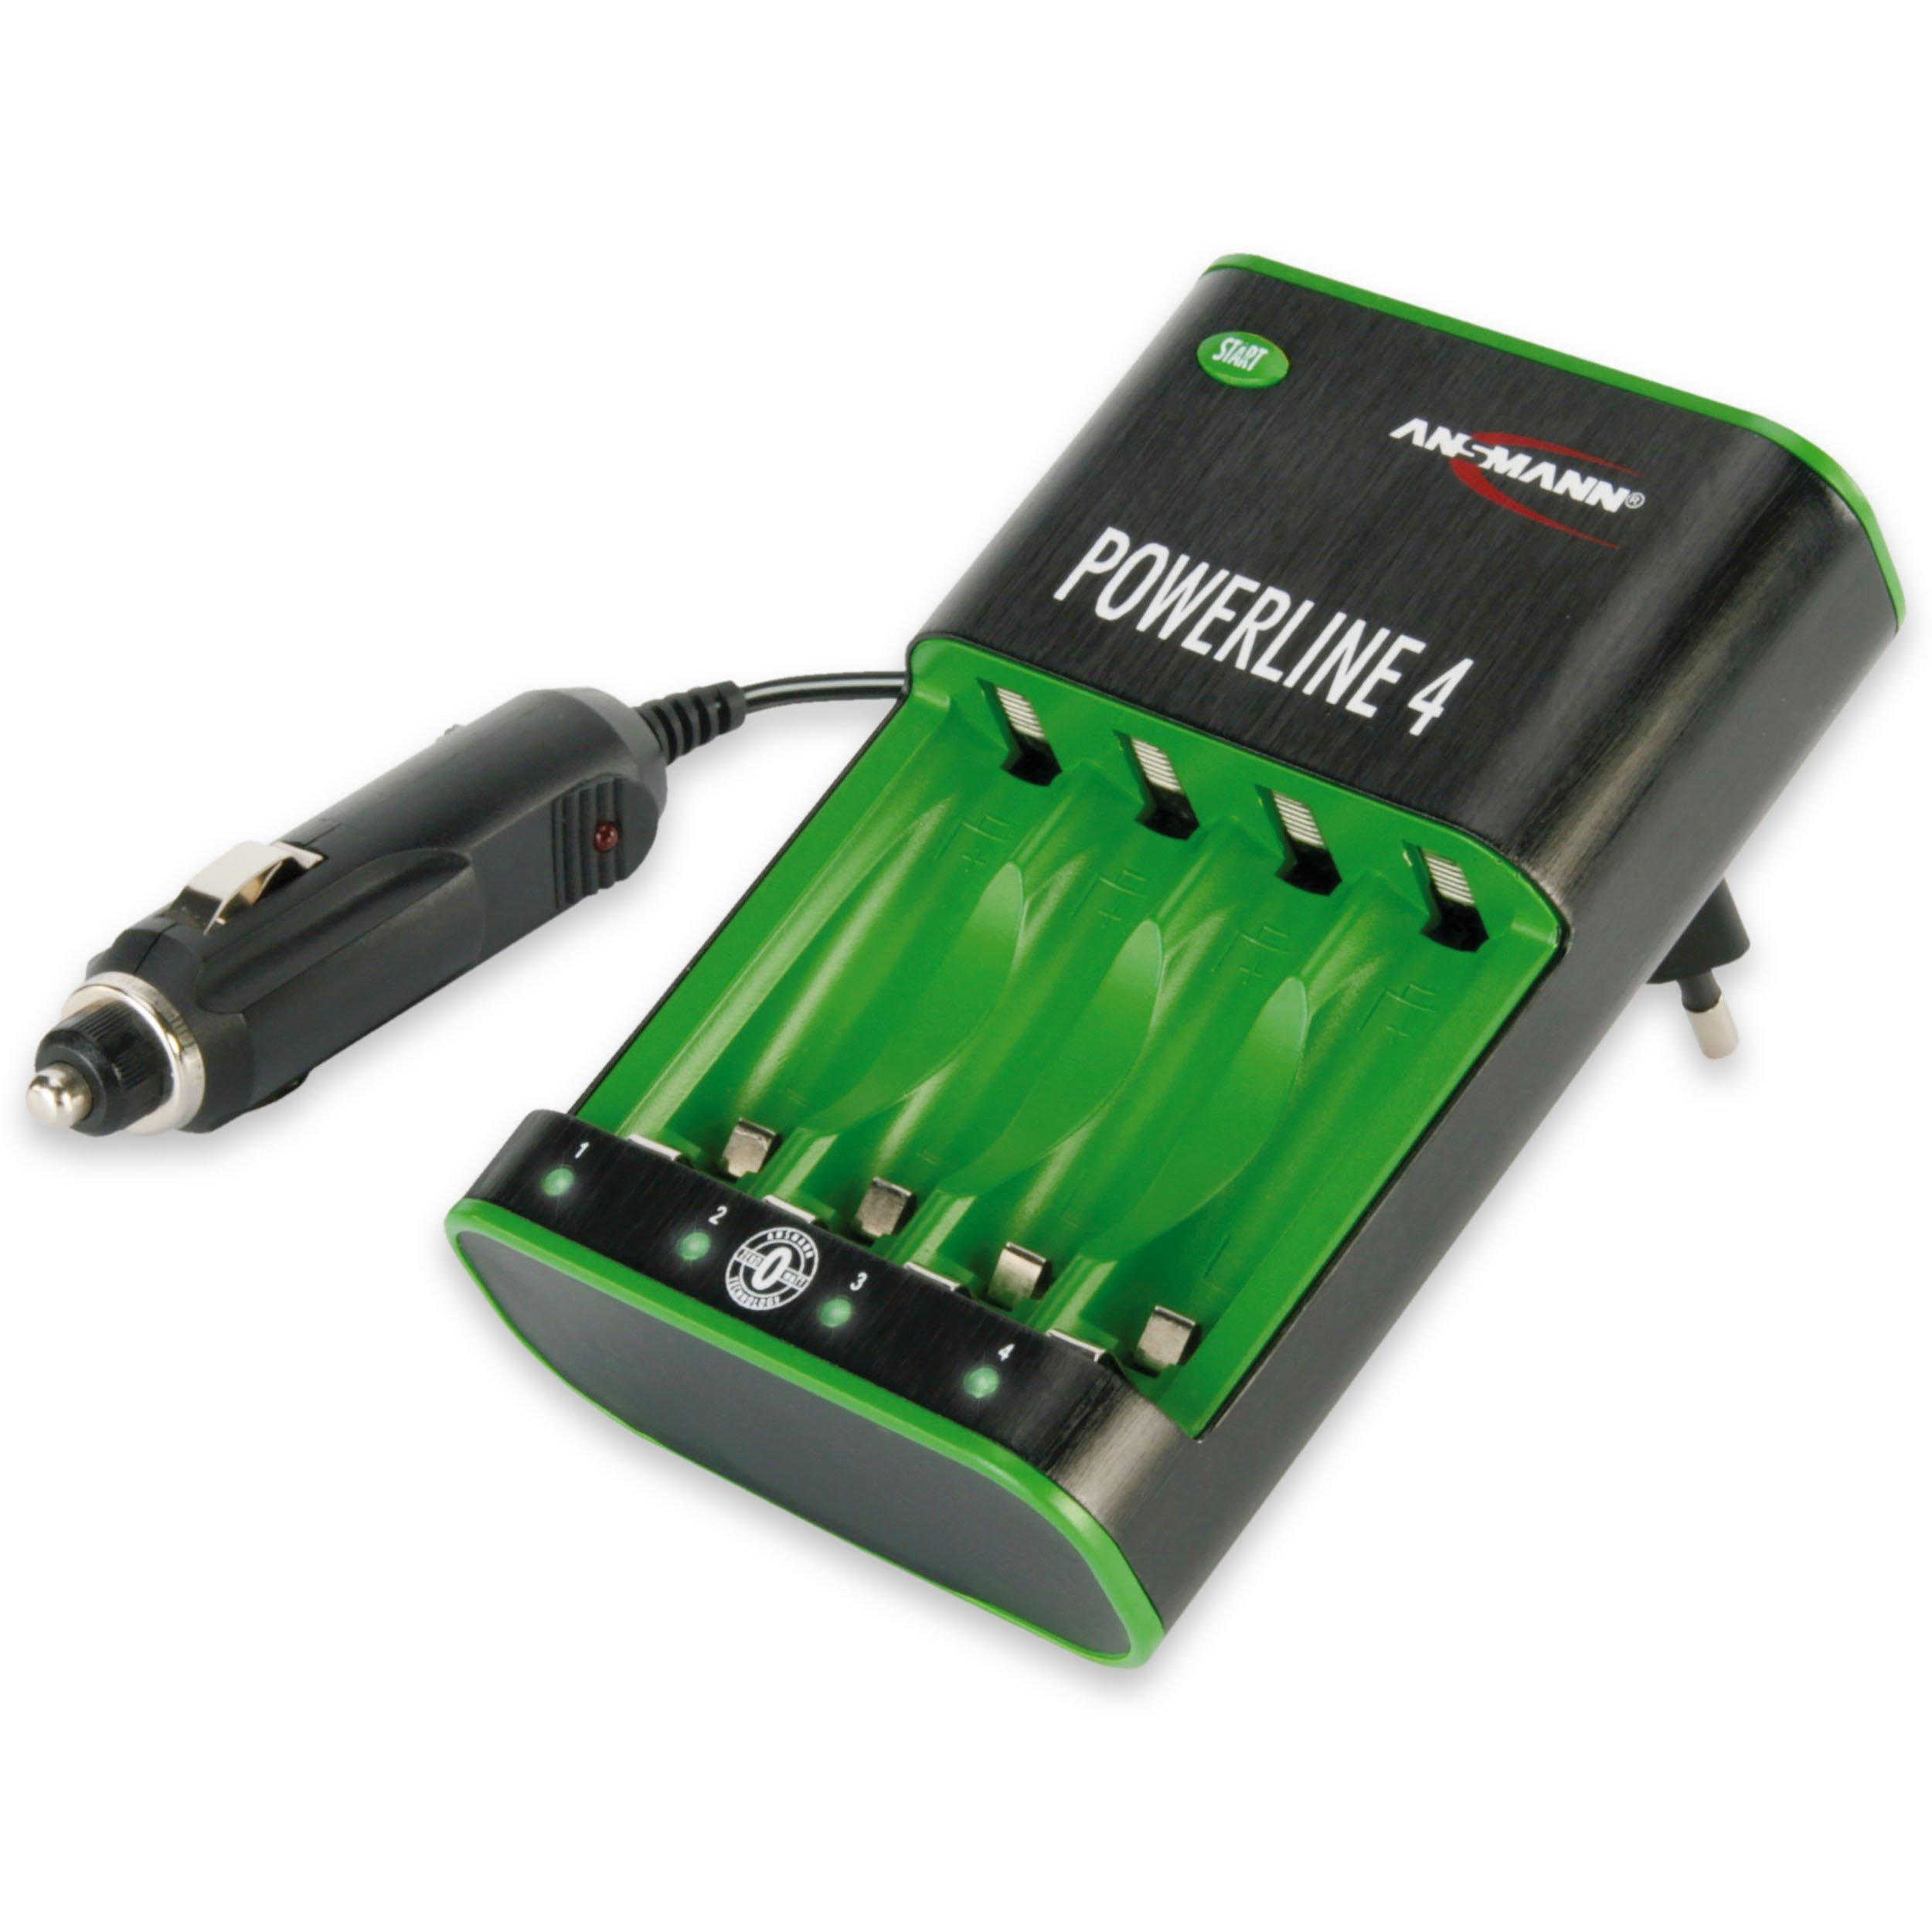 Powerline 4 ZeroWatt Caricabatterie a Risparmio Energetico per Batterie Micro AAA | Mignon AA